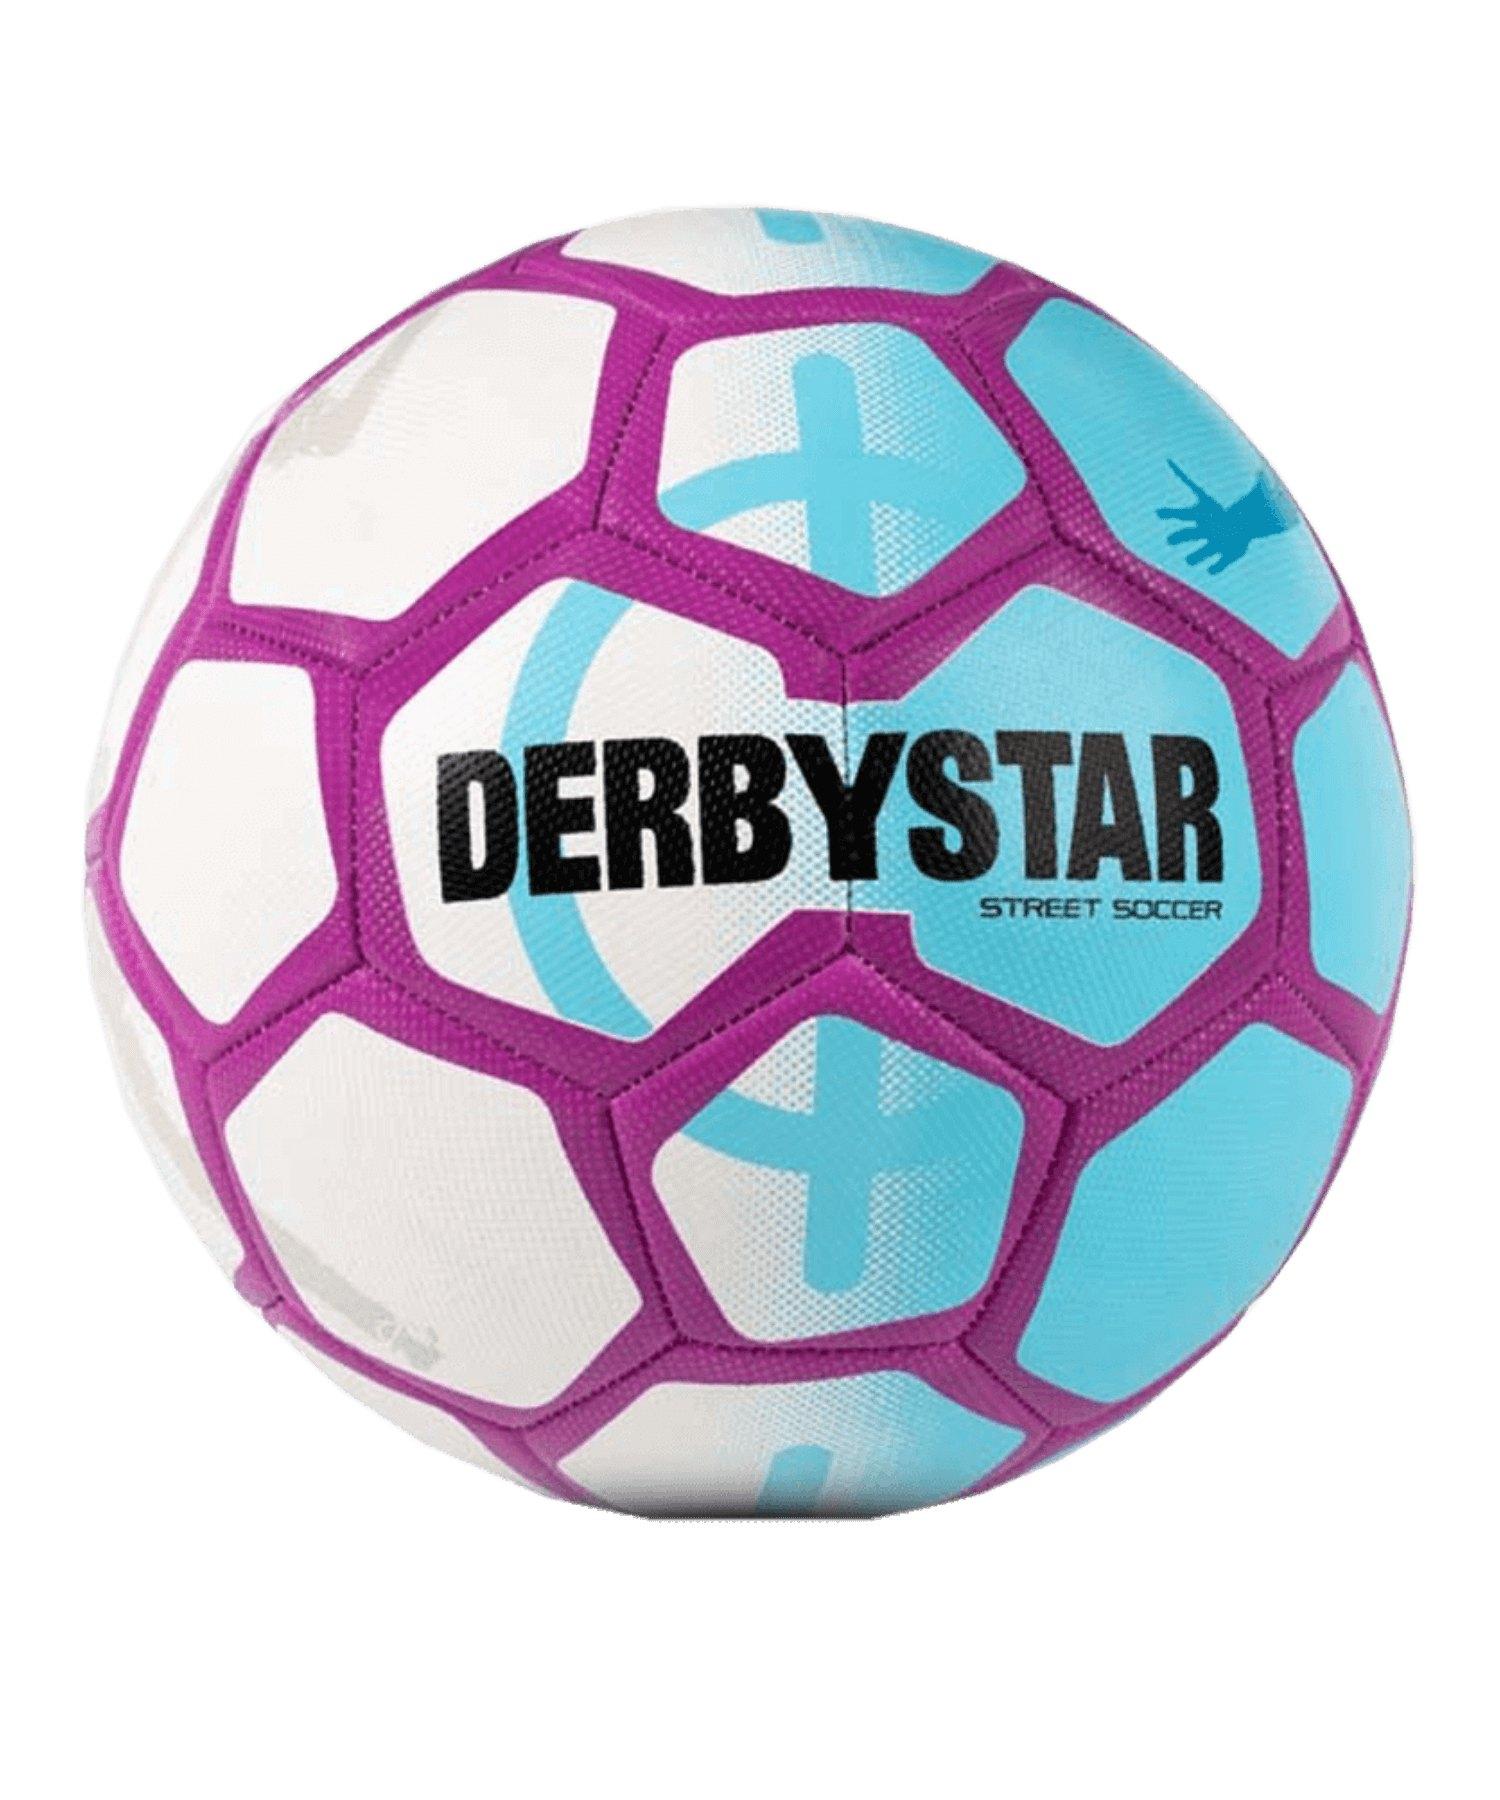 Derbystar Street Soccer Fussball Weiss Blau F169 - weiss